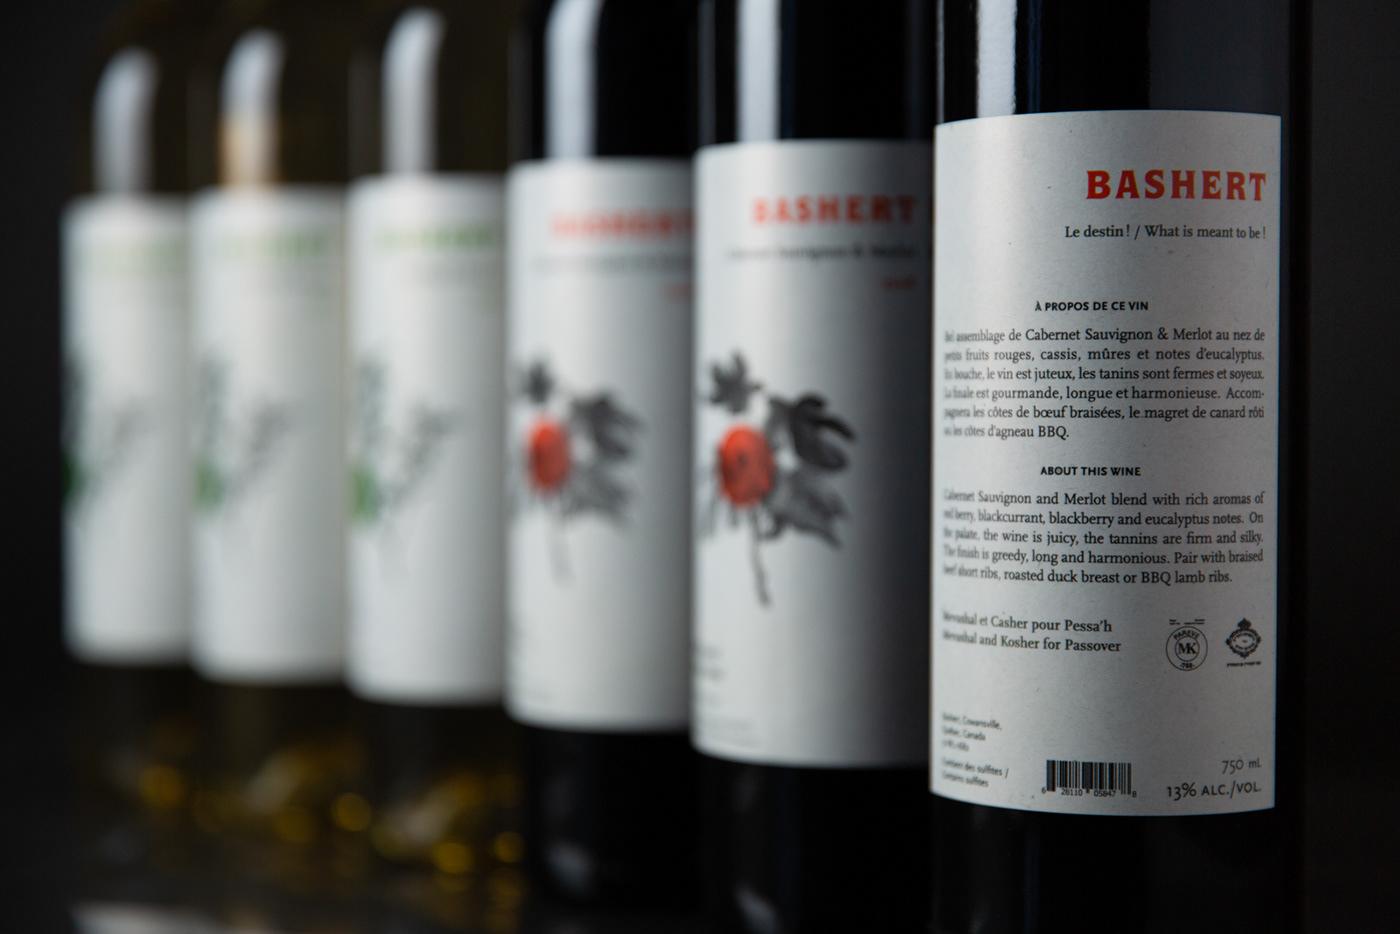 casher,Flowers,israel,kosher,Label,Packaging,wine,winery,Wines,Montreal